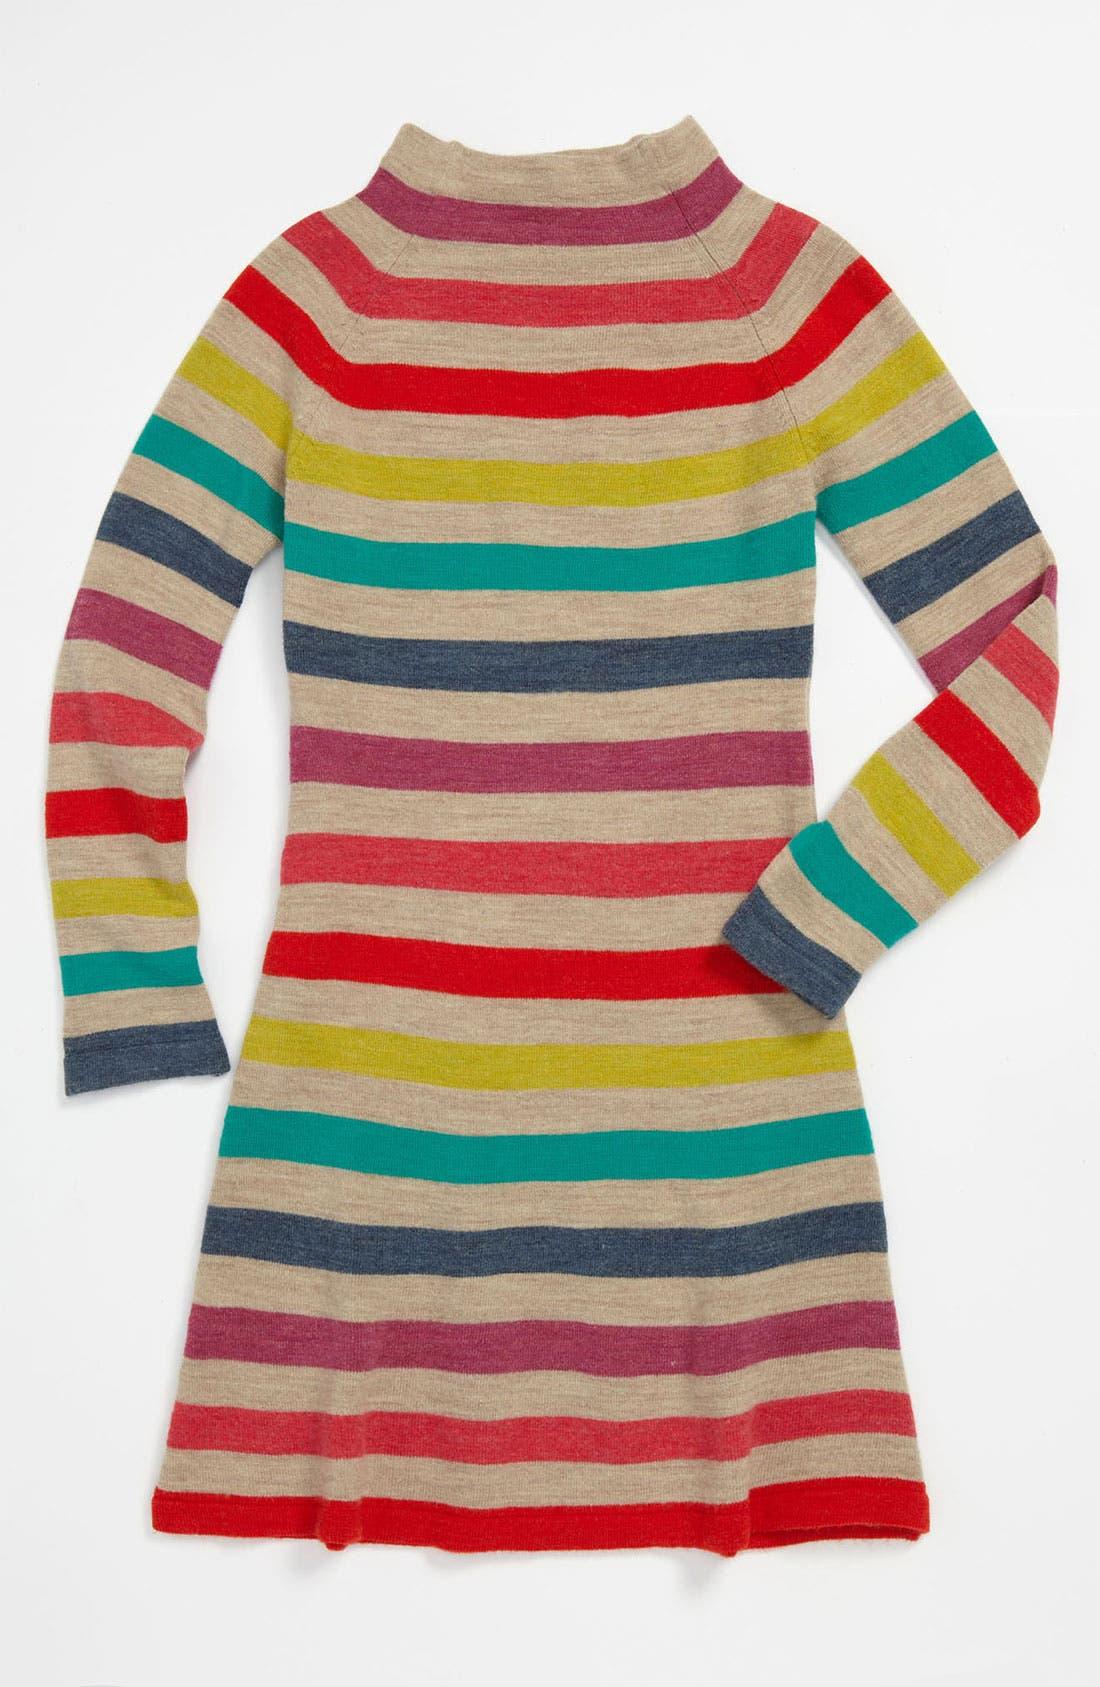 Main Image - United Colors of Benetton Kids Stripe Sweater Dress (Little Girls & Big Girls)